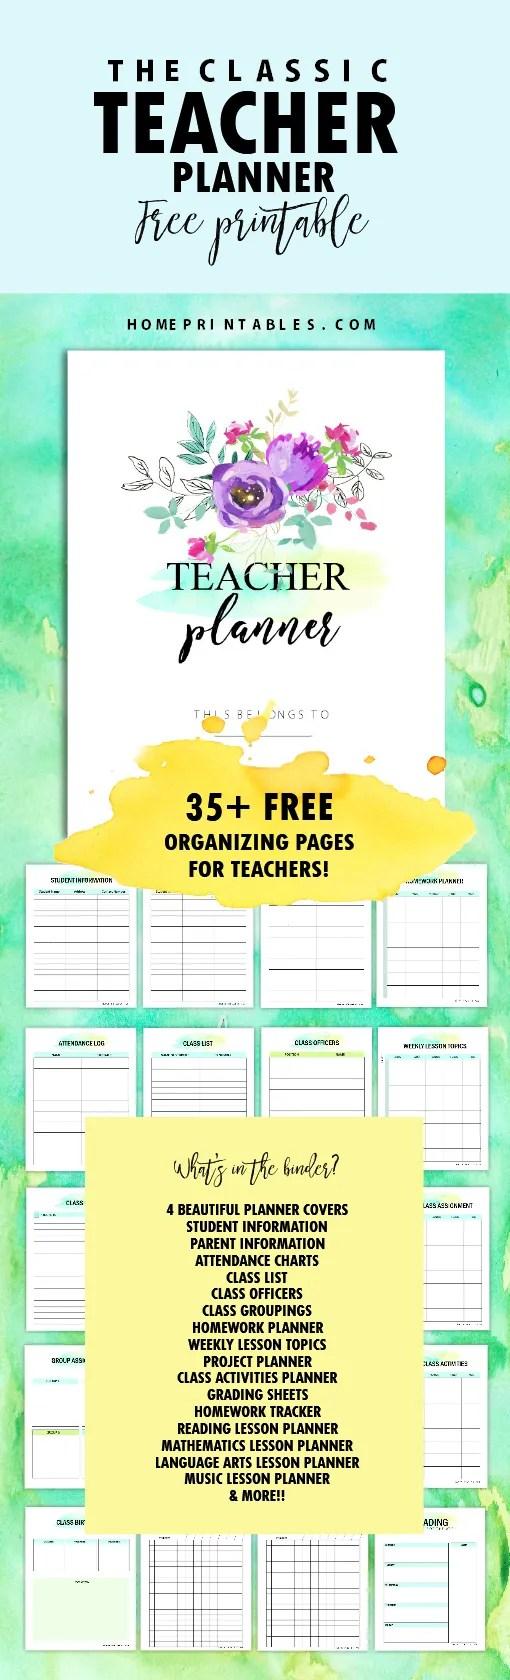 Free Printable Worksheets For Teachers : Free teacher planner printables organizing sheets